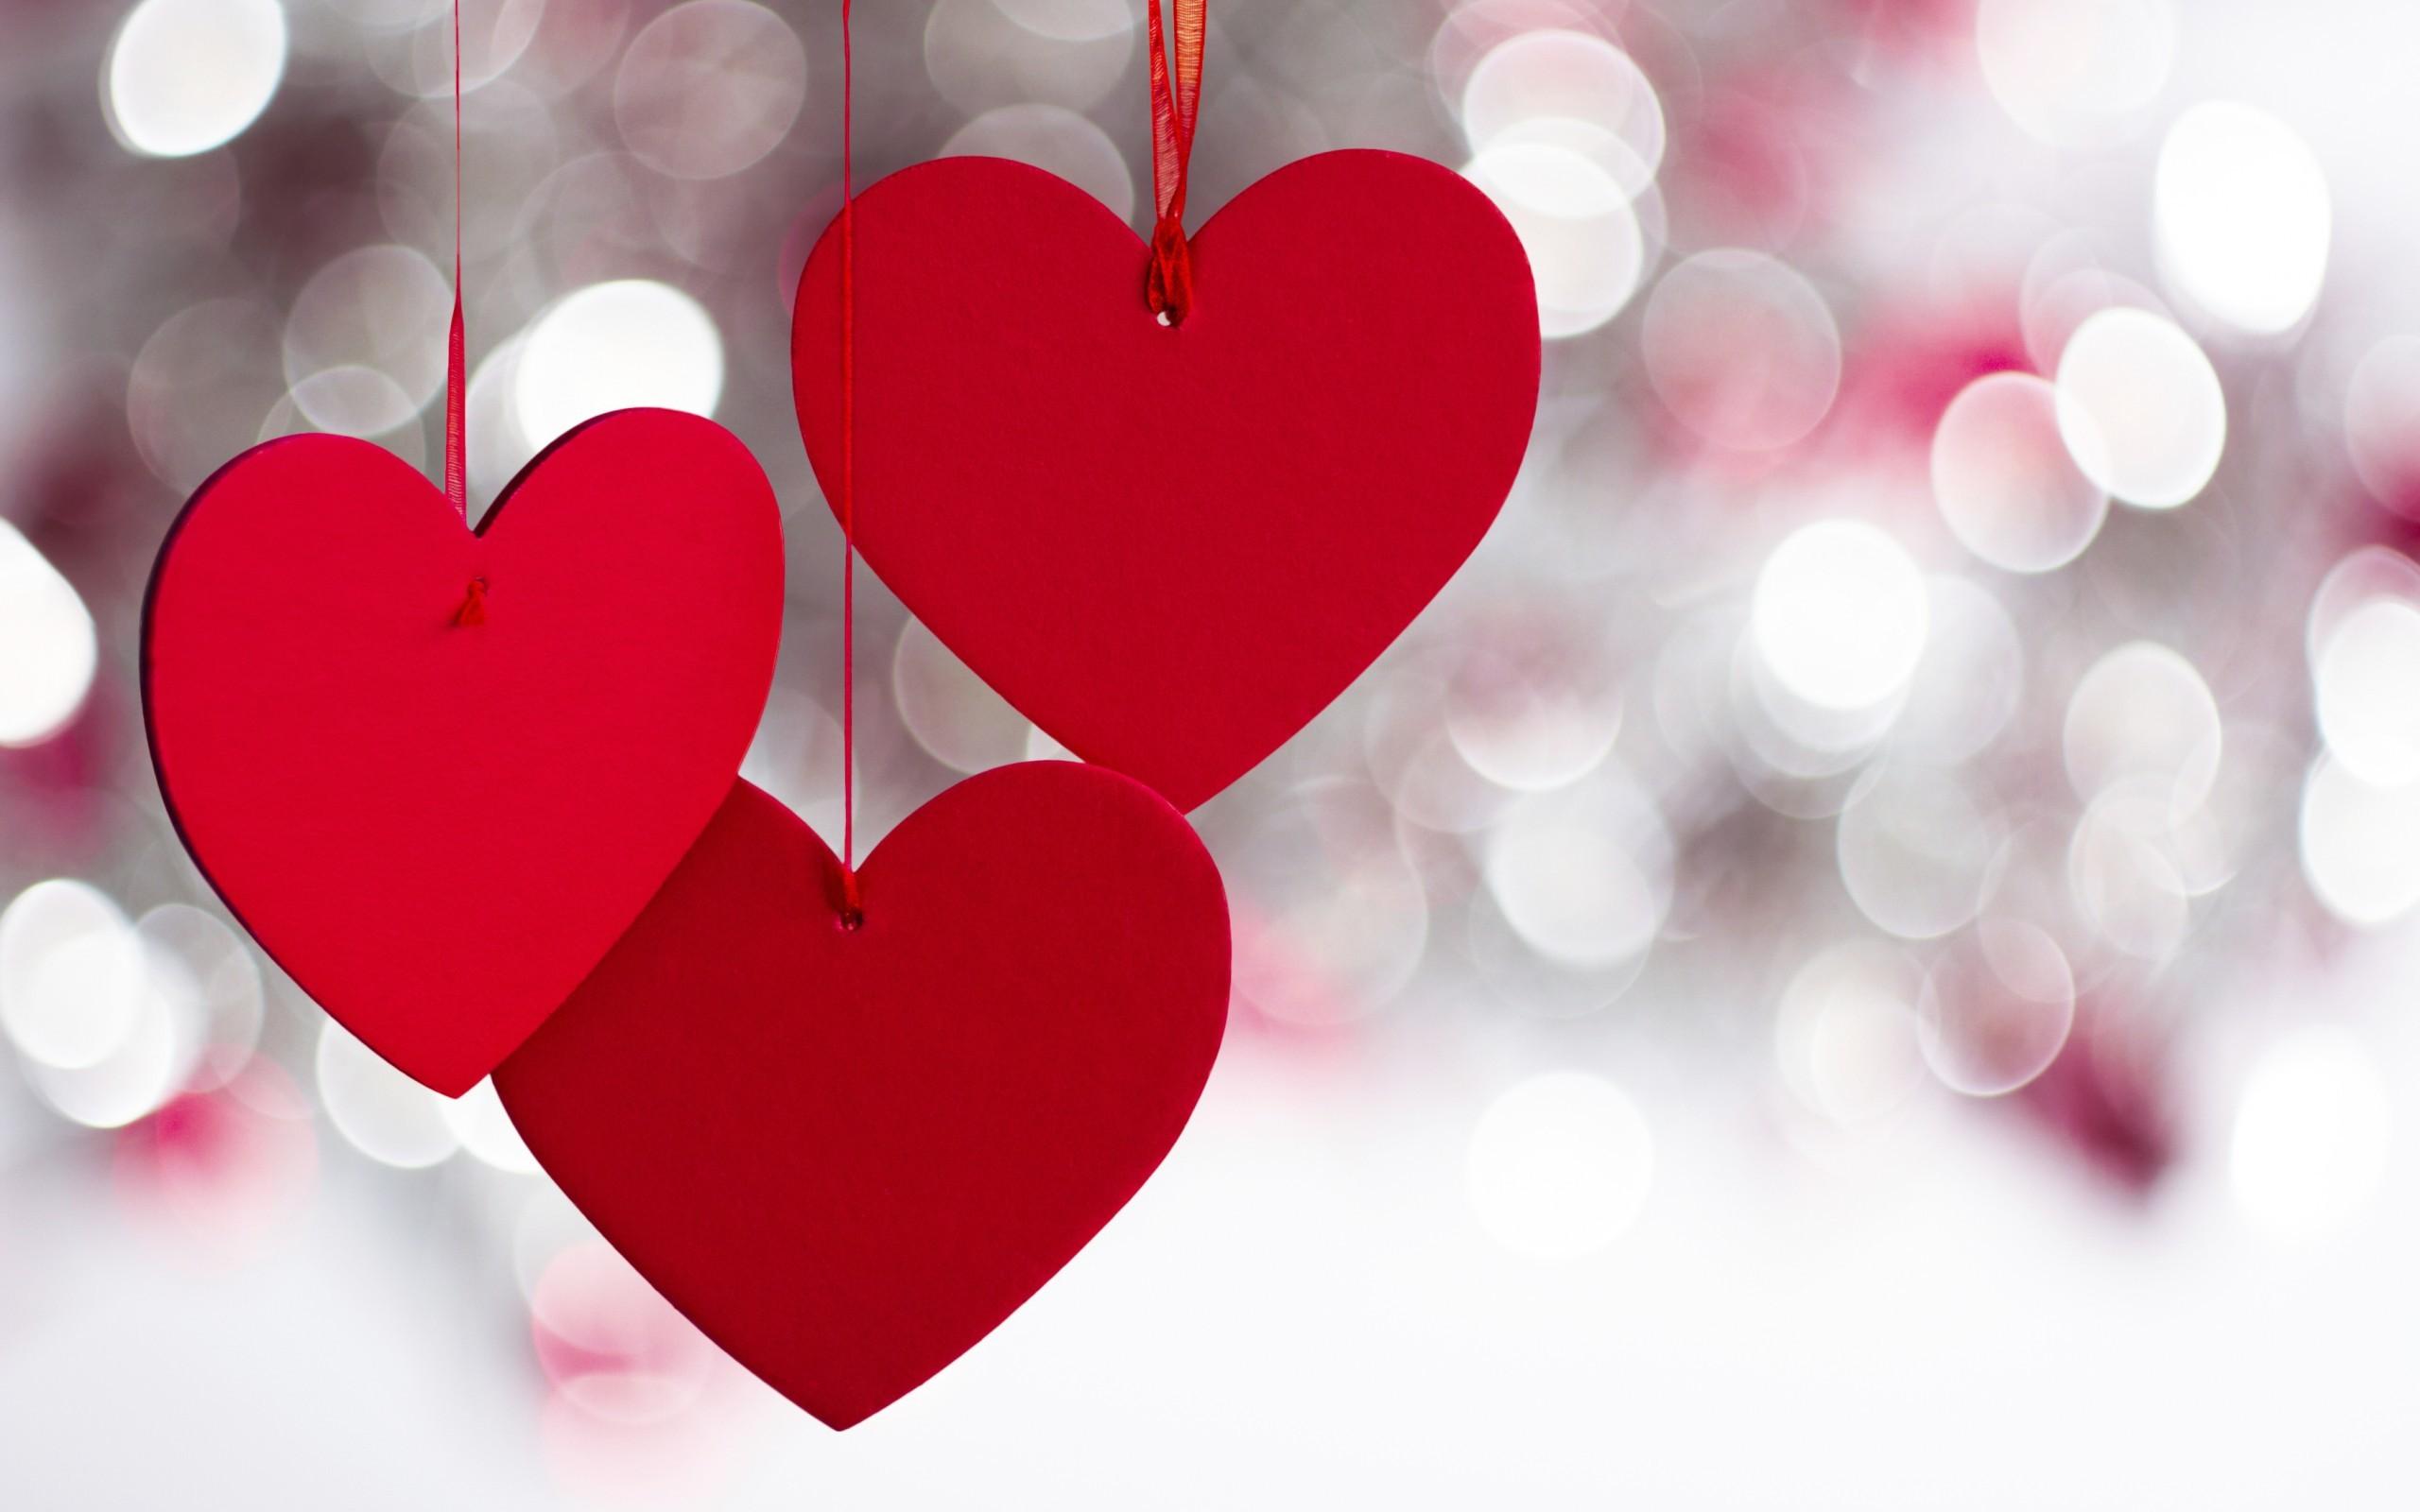 valentine desktop wallpaper ·①, Ideas